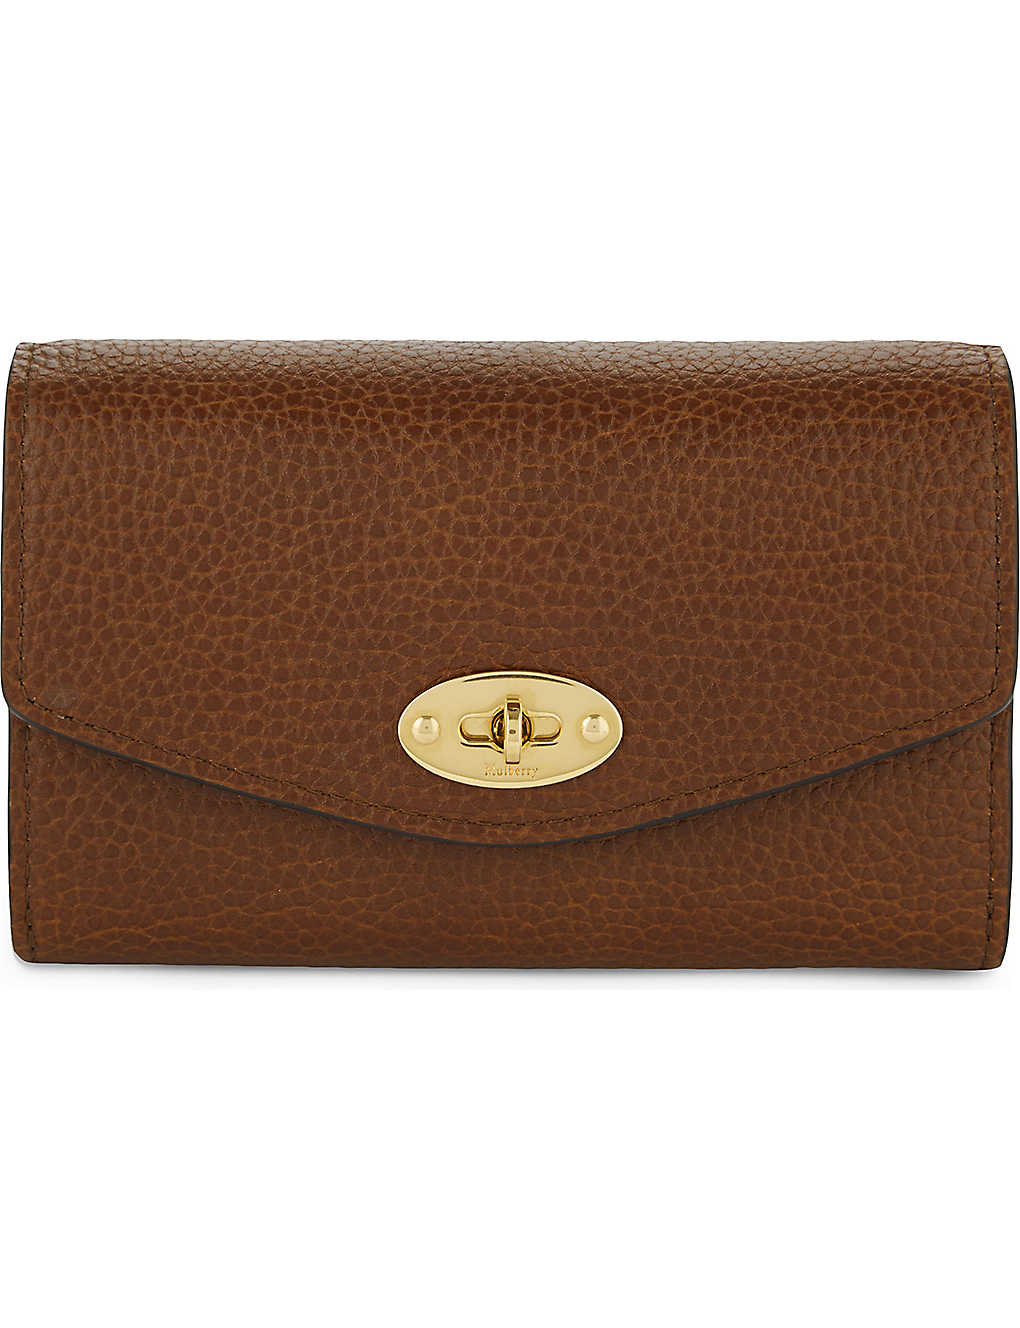 a9fc163df9 MULBERRY - Darley medium grained leather wallet | Selfridges.com